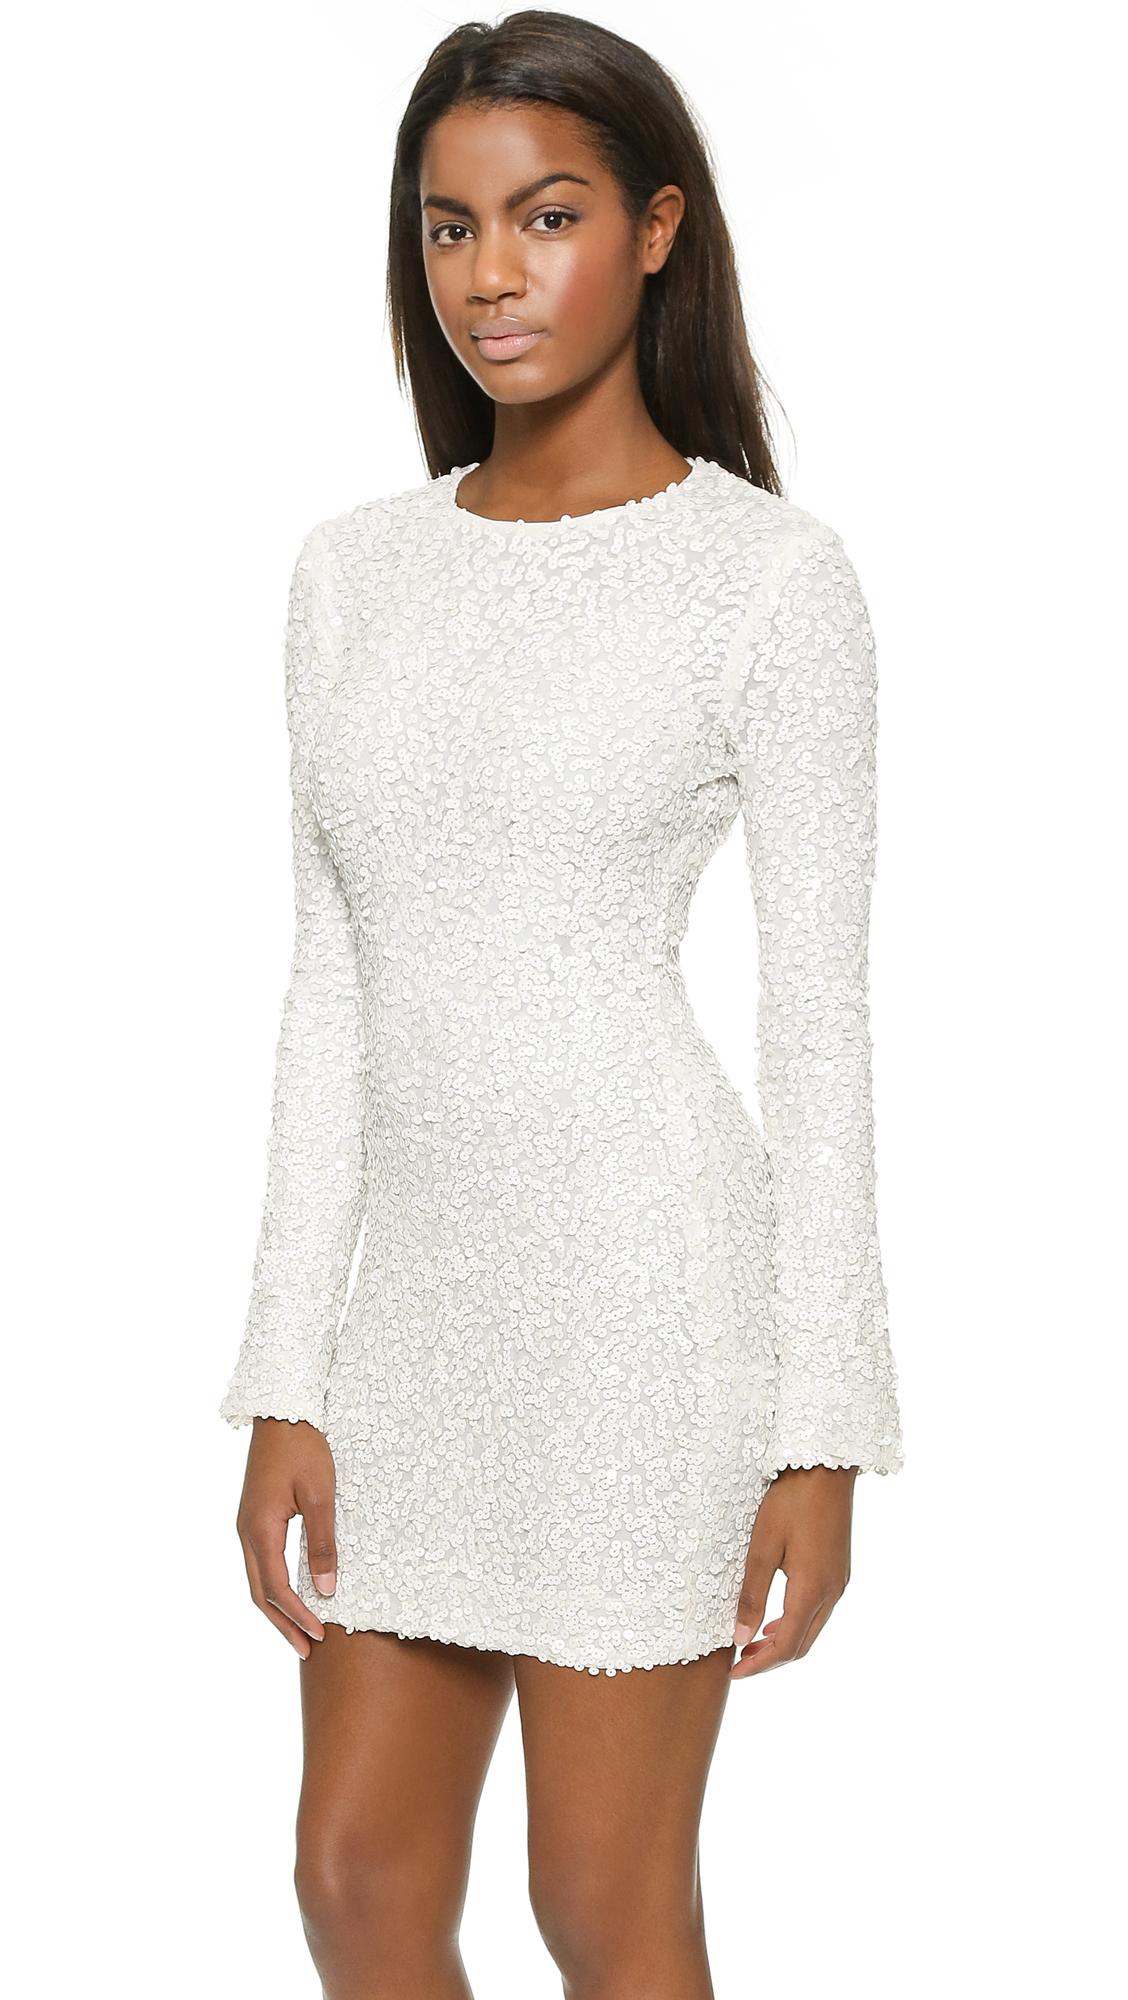 Rachel zoe Bell Sleeve Sequin Mini Dress - Ivory in White  Lyst